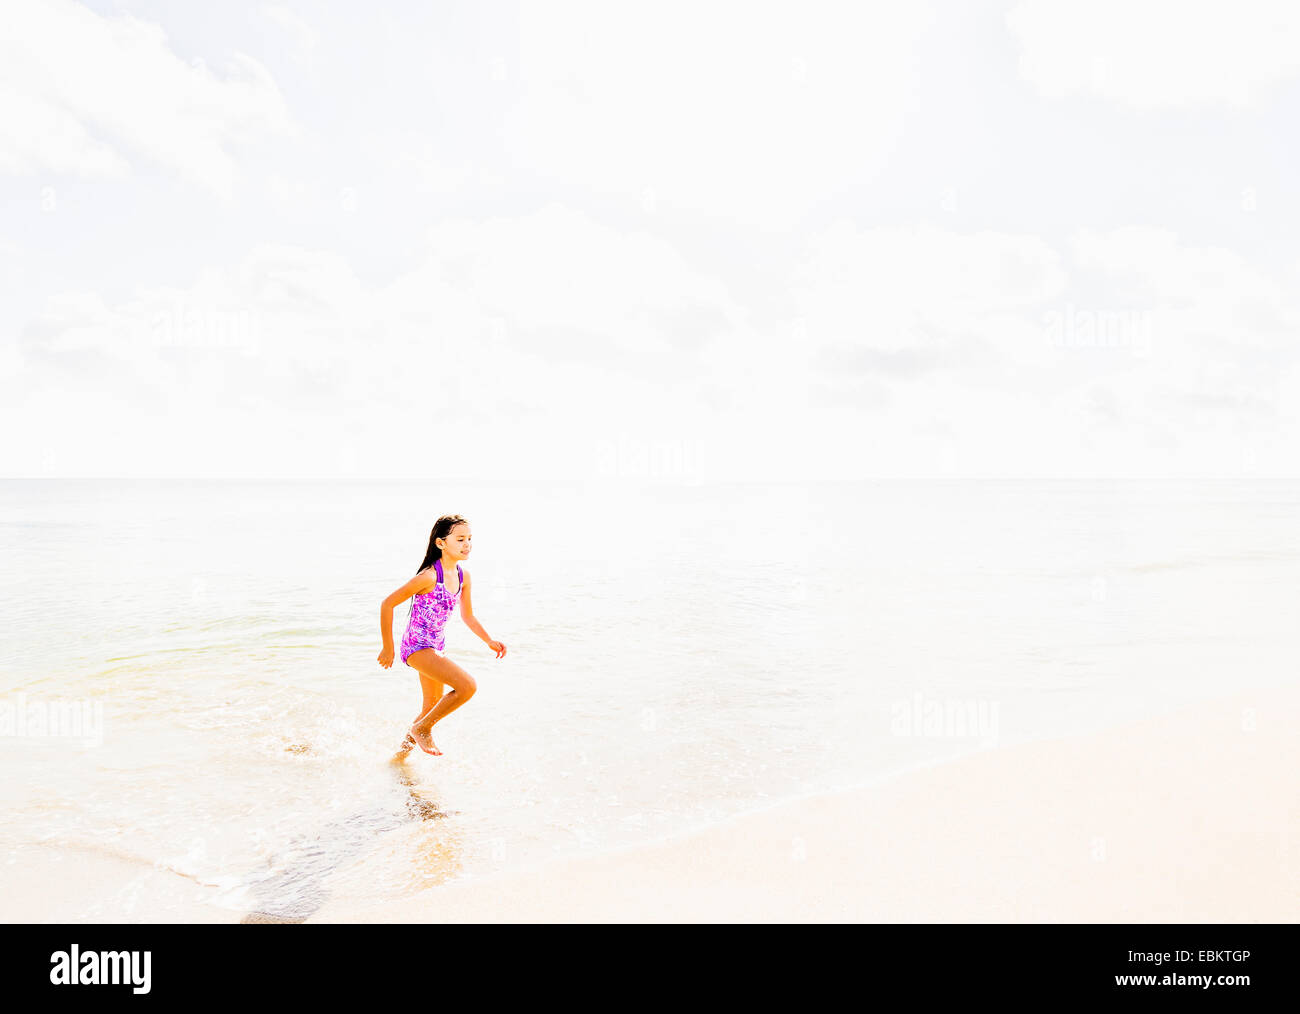 USA, Florida, Jupiter, Girl (6-7) running on beach -